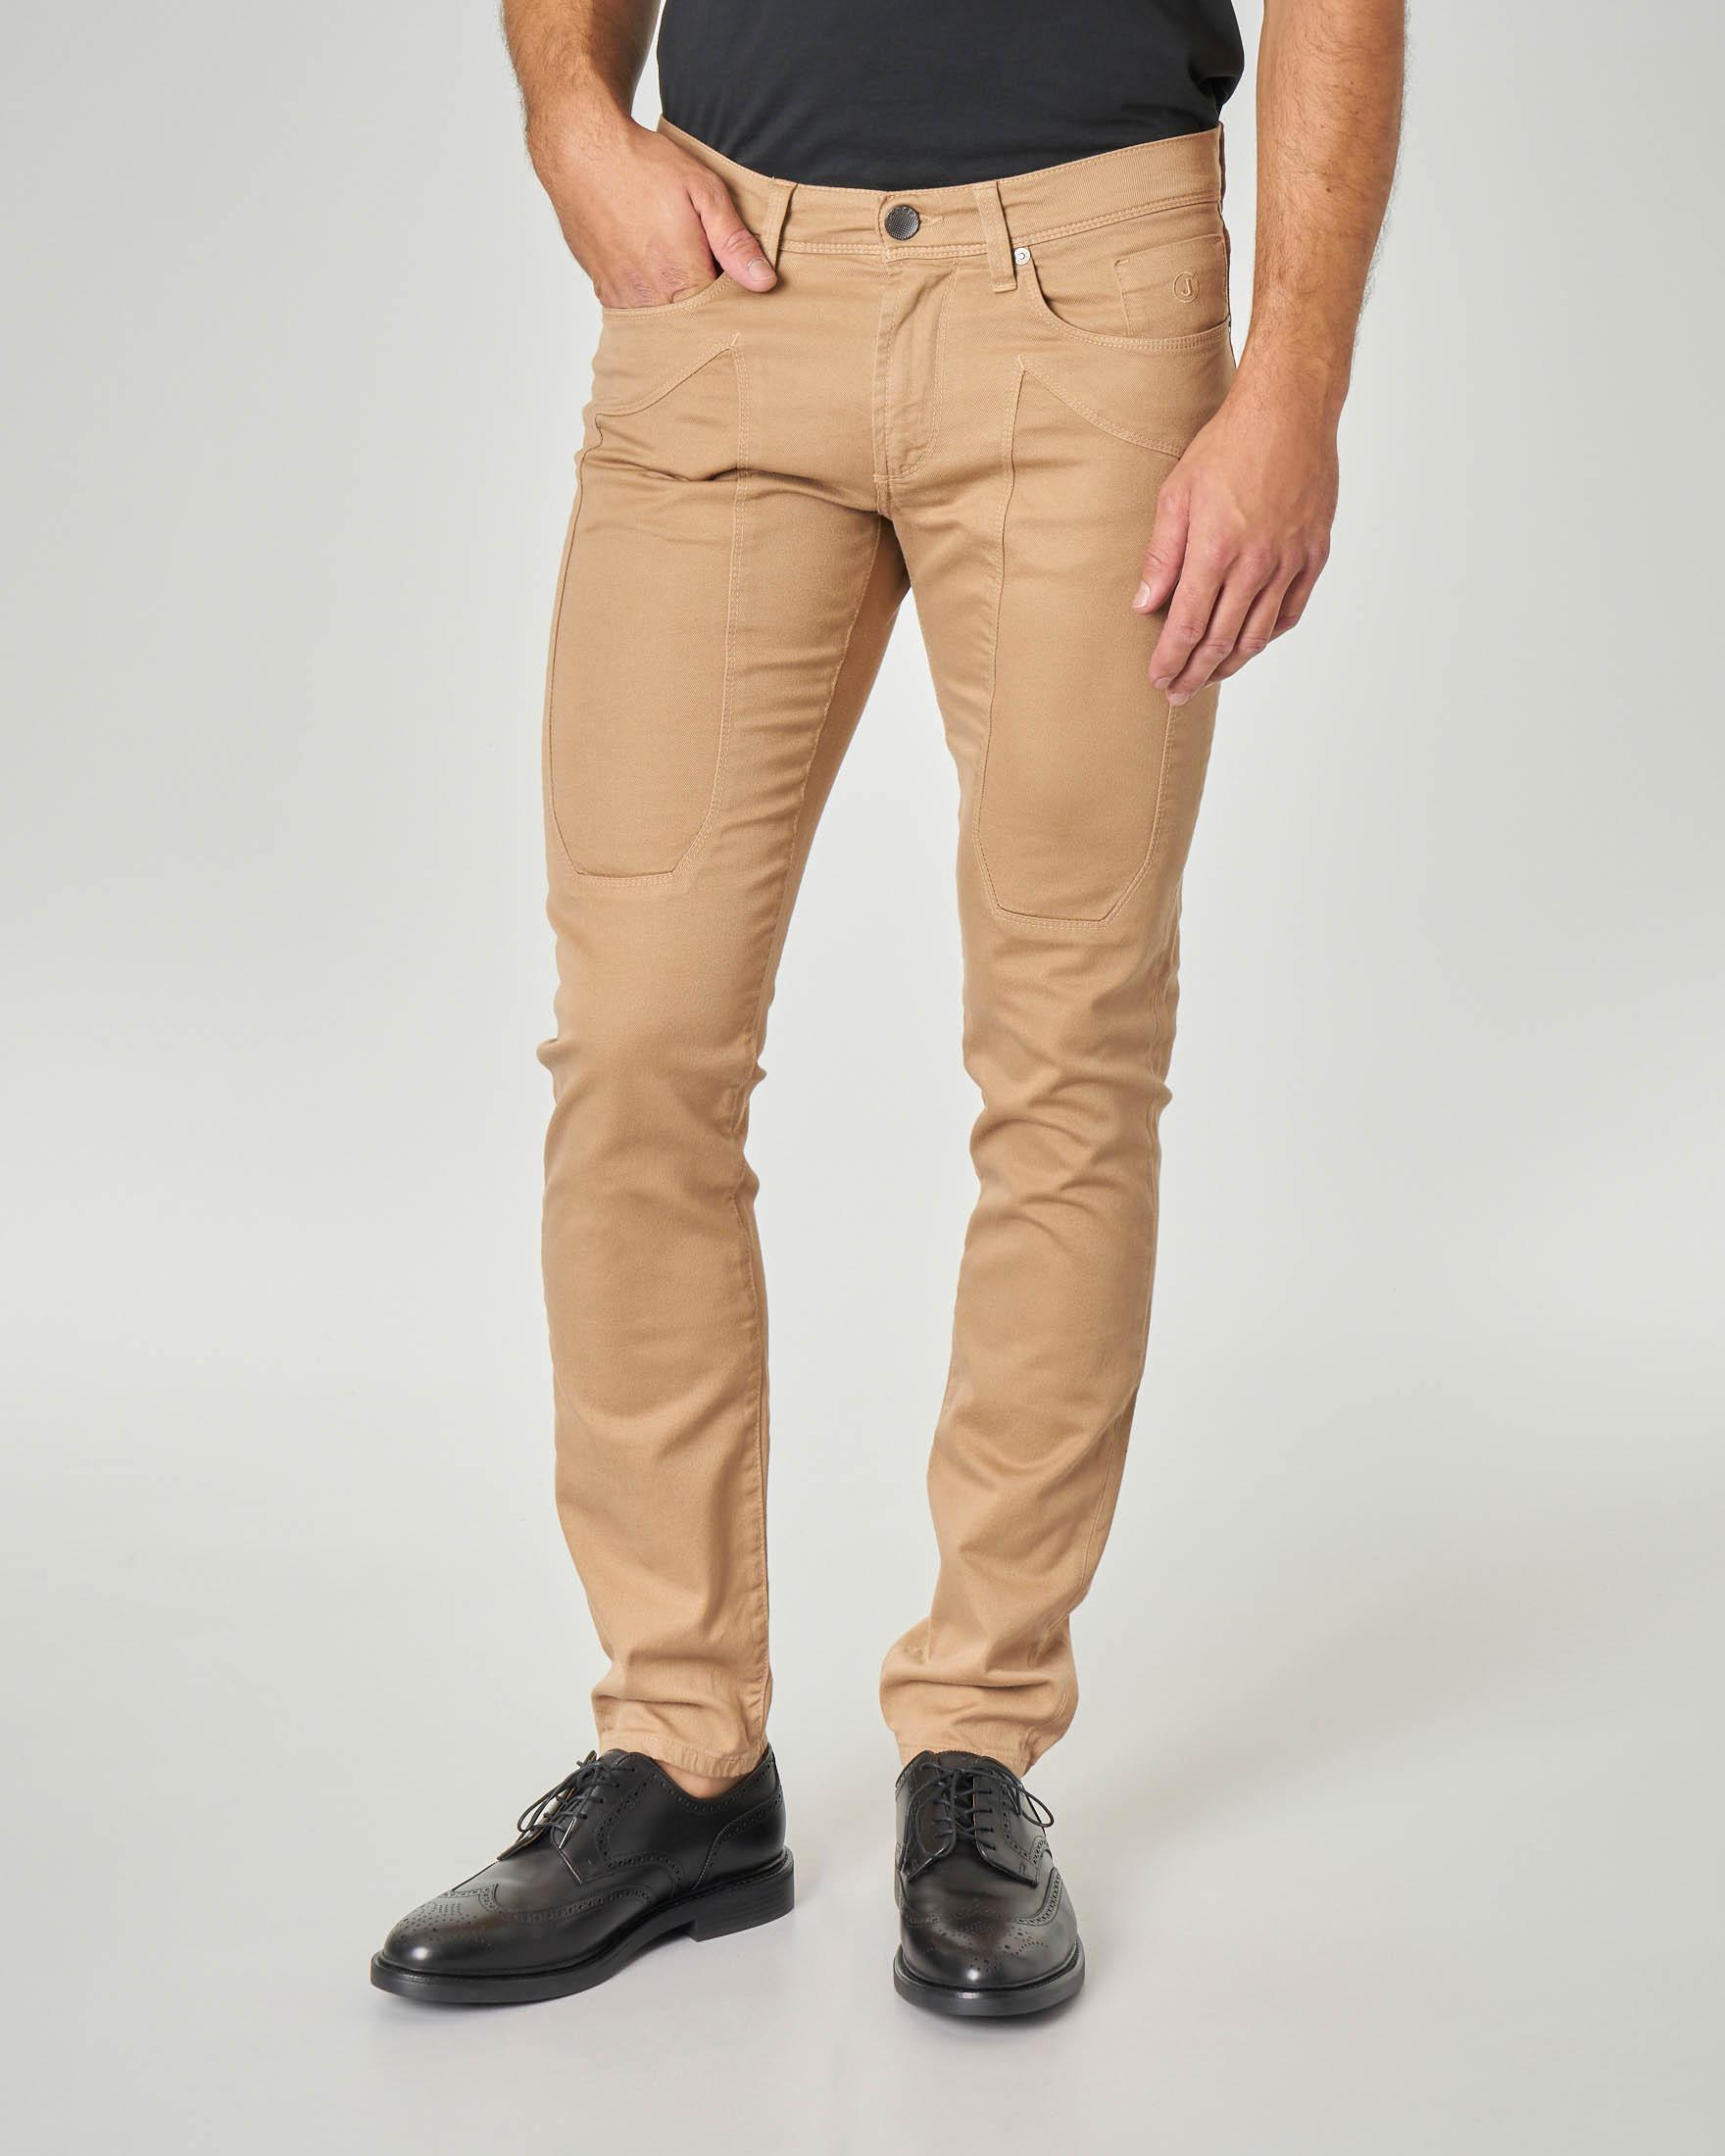 Pantalone cinque tasche beige in gabardina con toppa